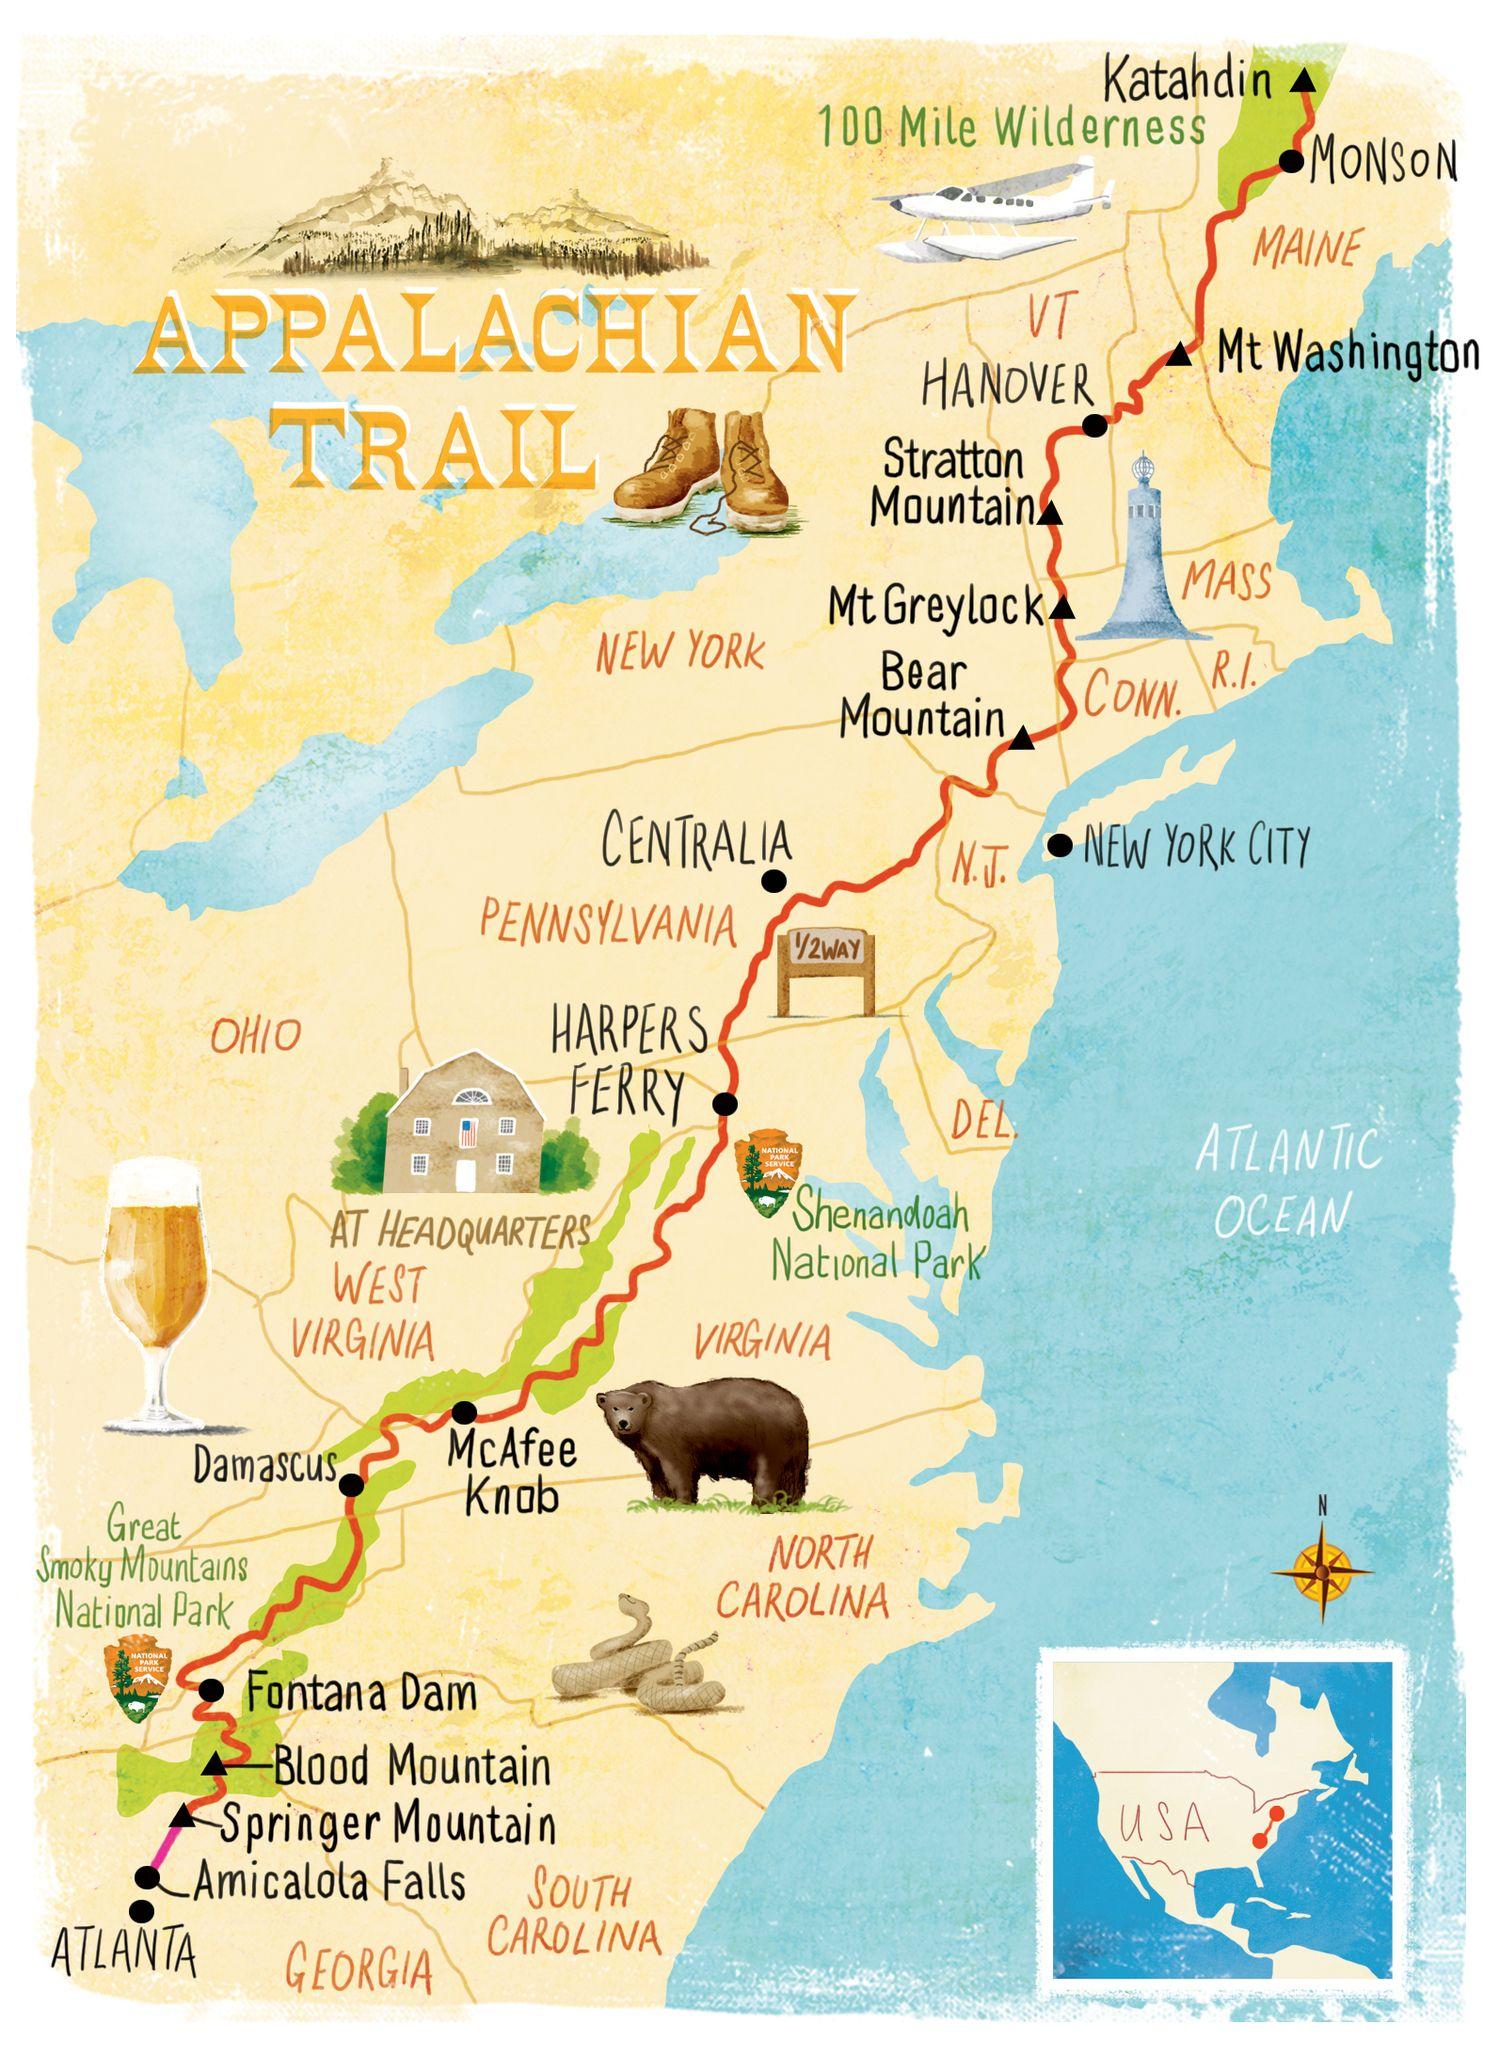 appalachian trail karte Appalachian Trail map Scott Jessop | Trips and sights in 2019